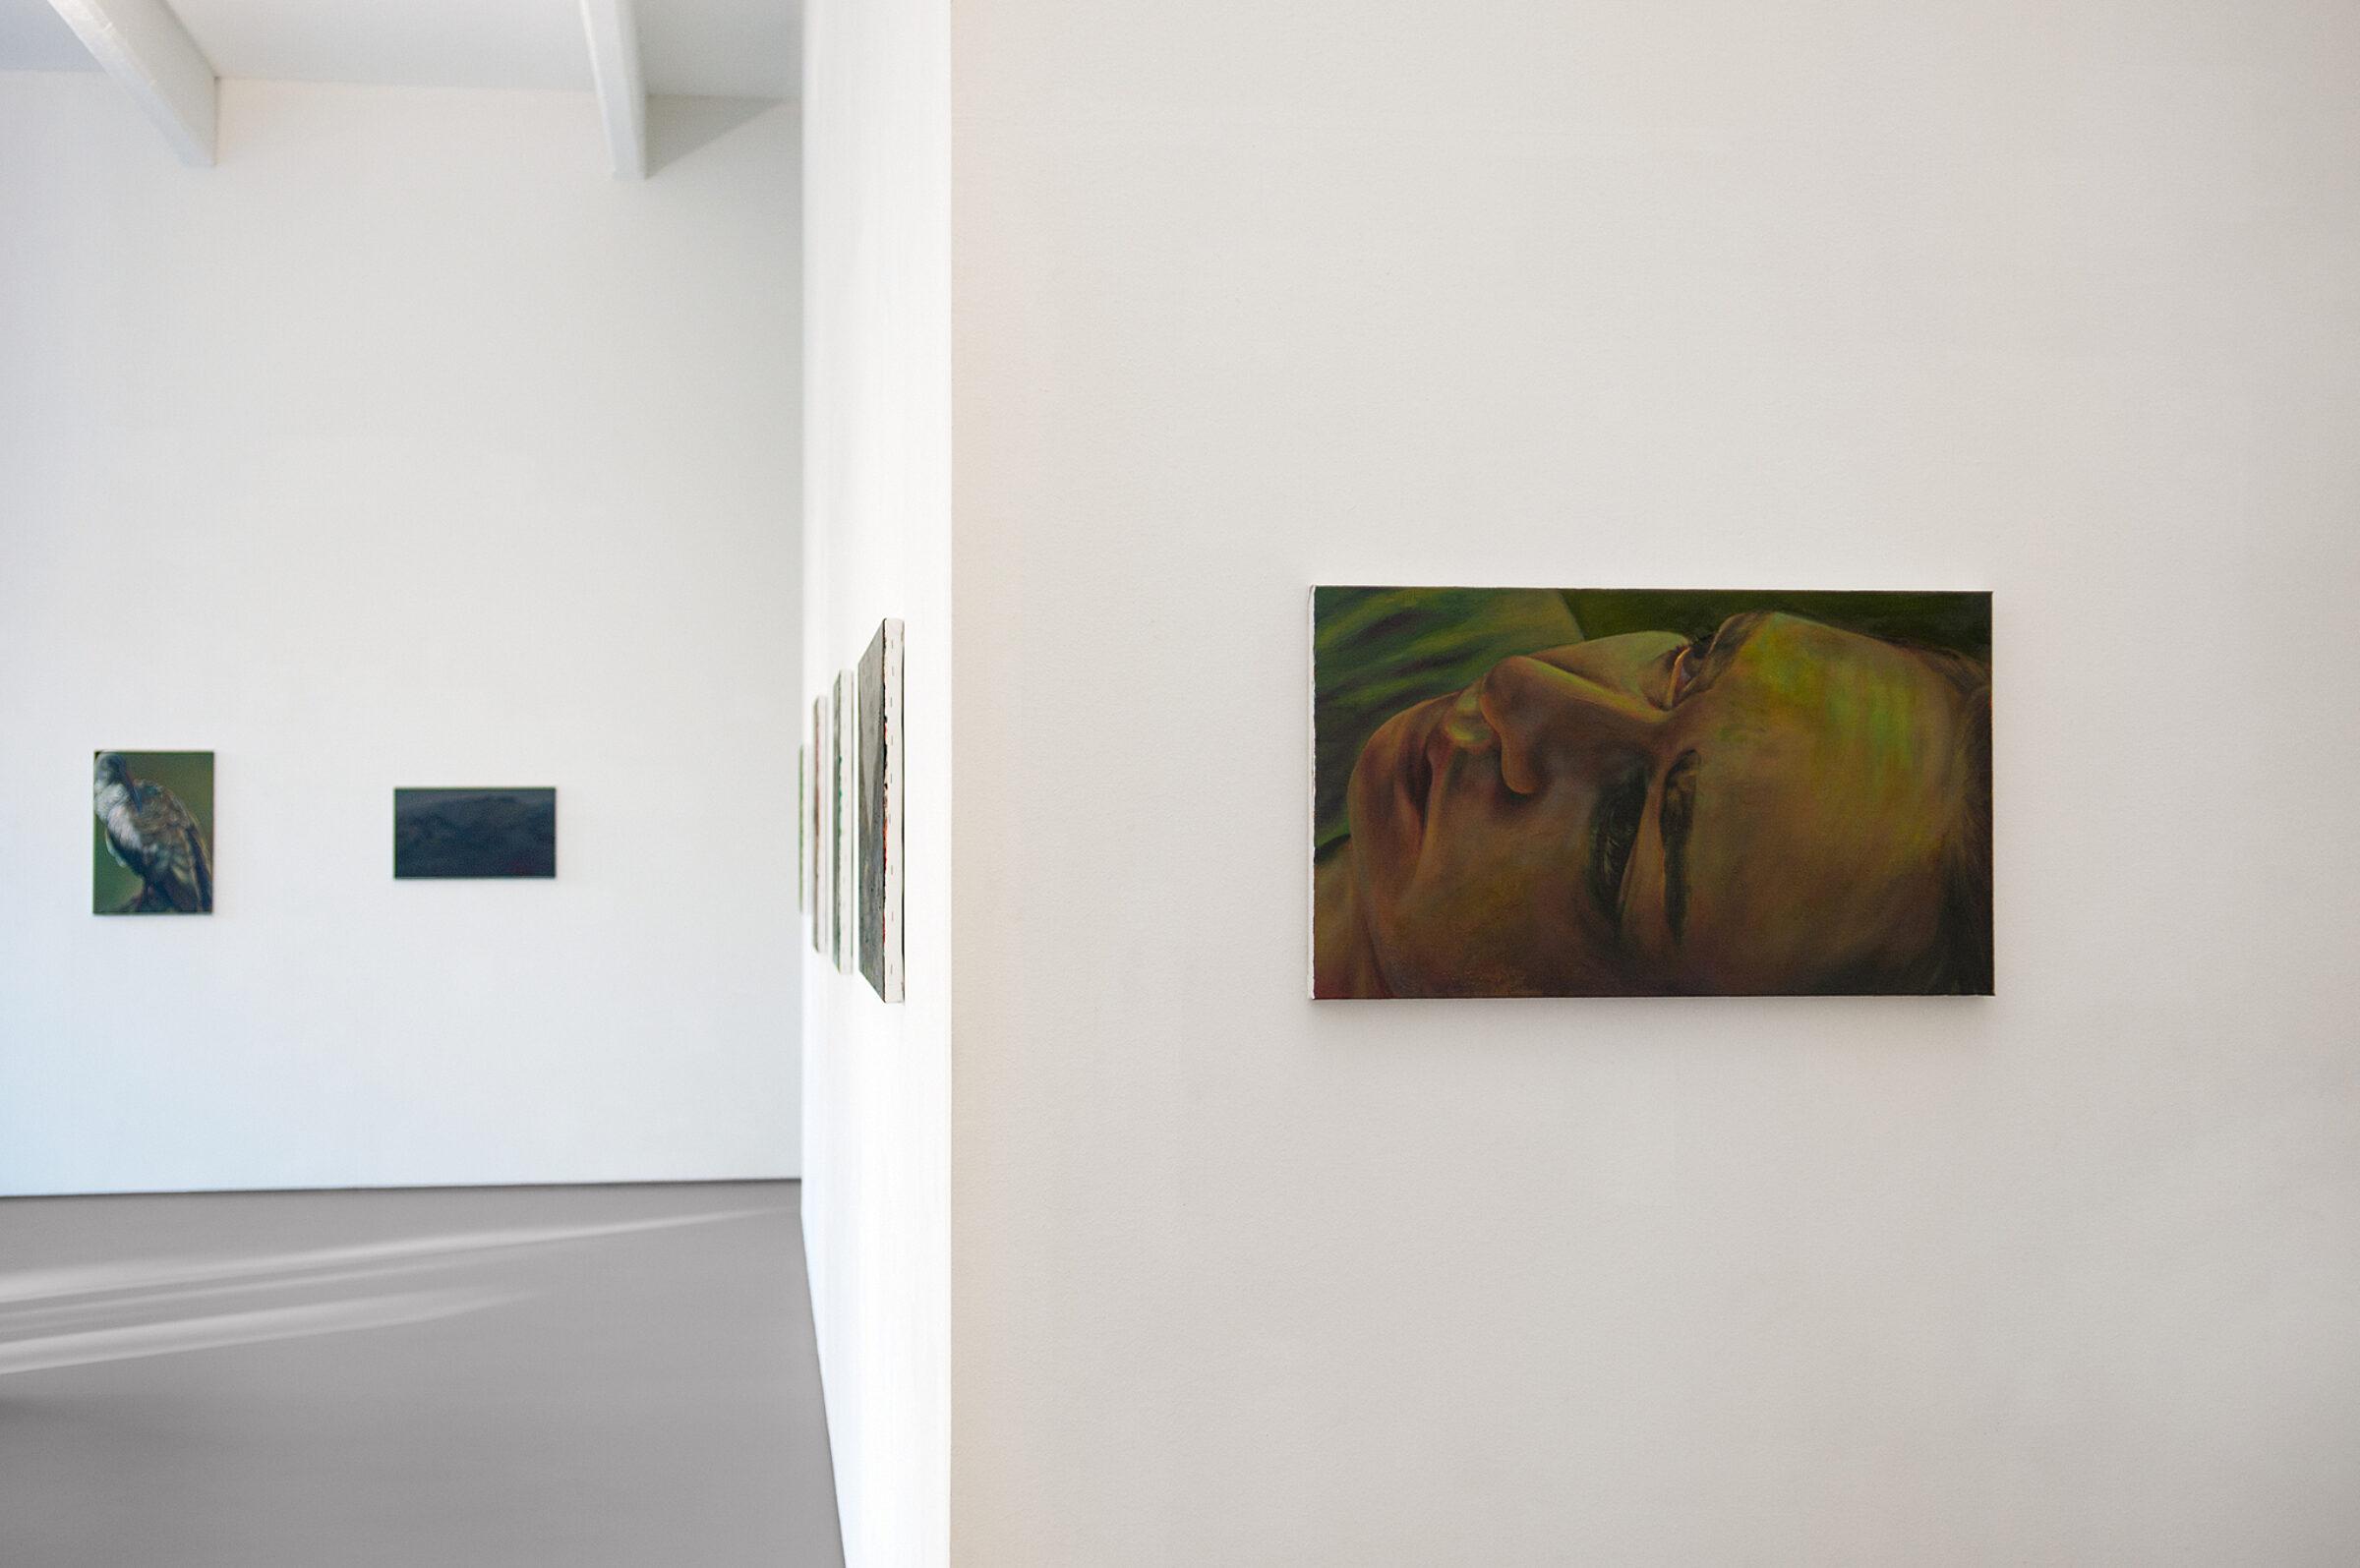 Ina_van_Zyl_-Galerie-Onrust-EX-landscape-01.jpg